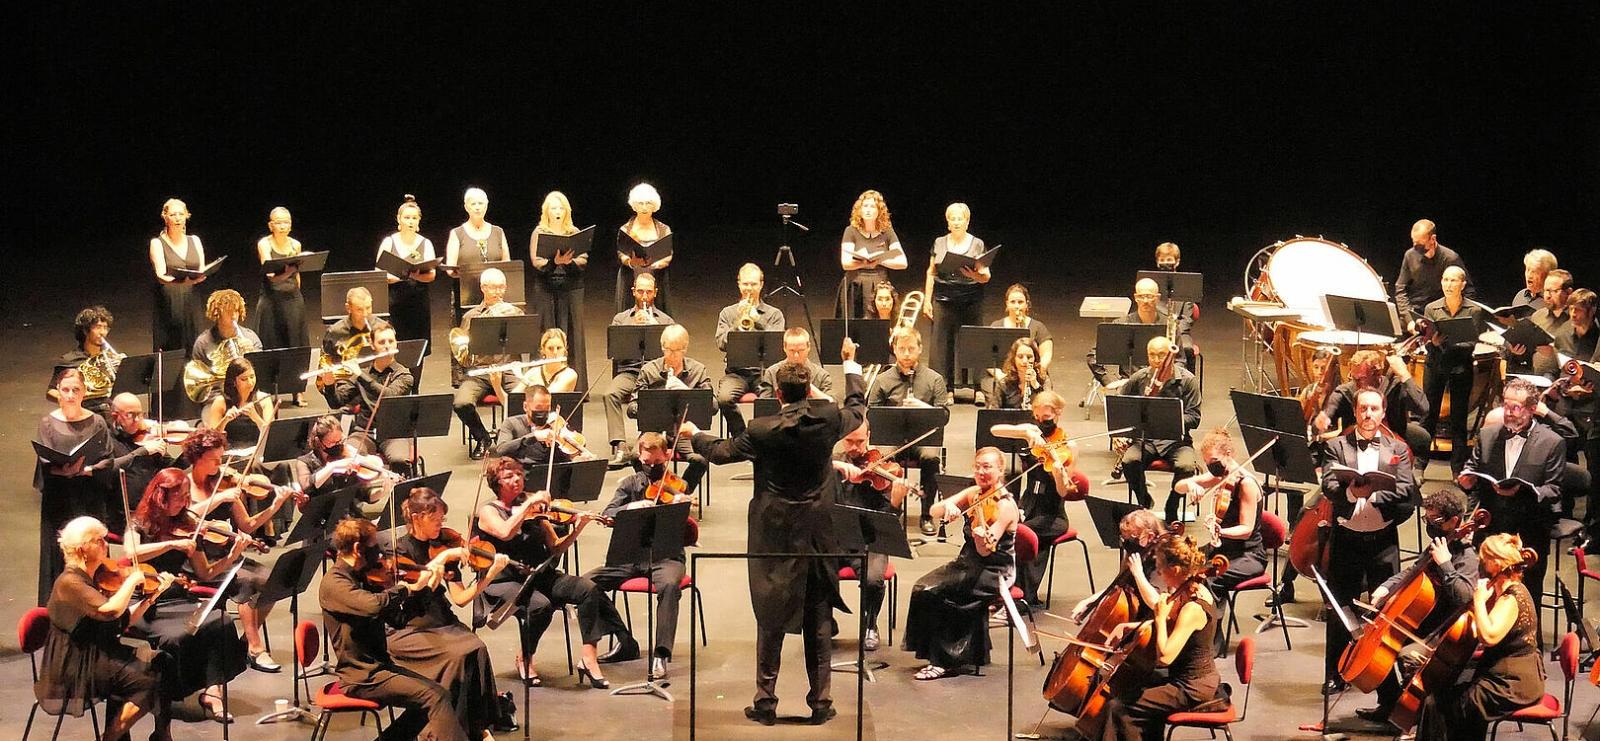 Concert hommage à Chopin